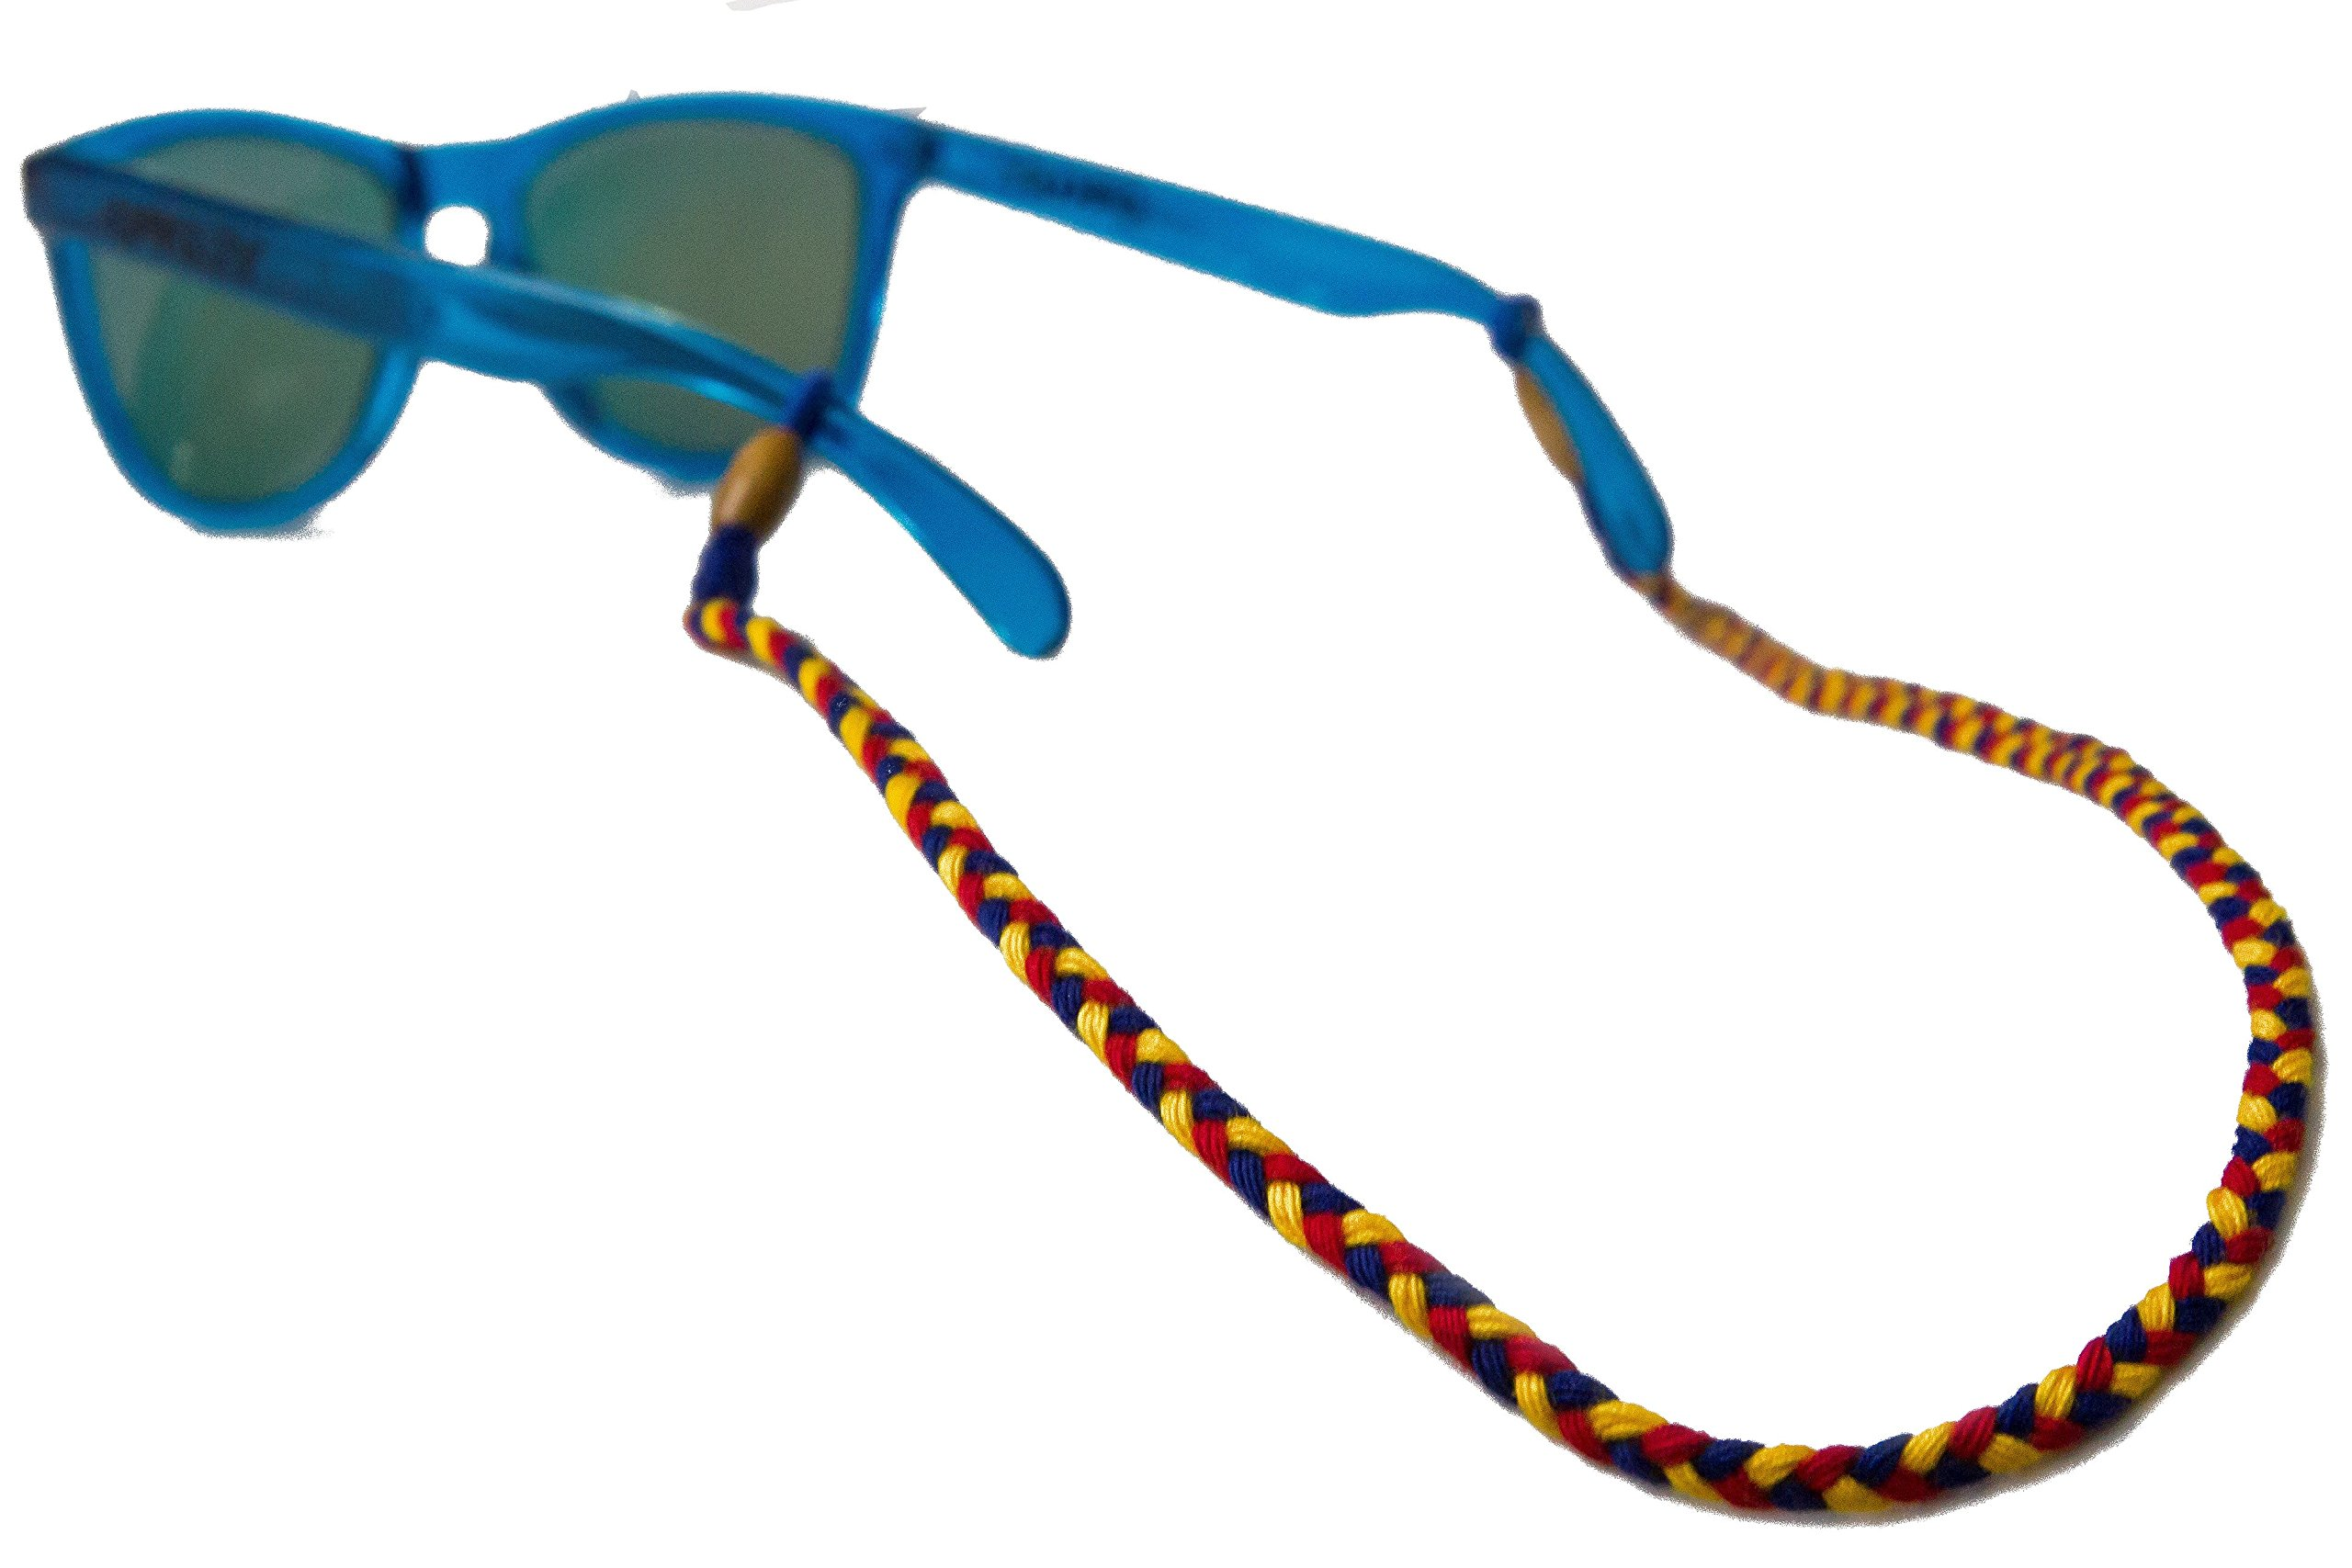 Adjustable Eyewear Retainer – Handmade Sunglass Strap Holder - Universal Fit Eyeglass Chain by Mayami